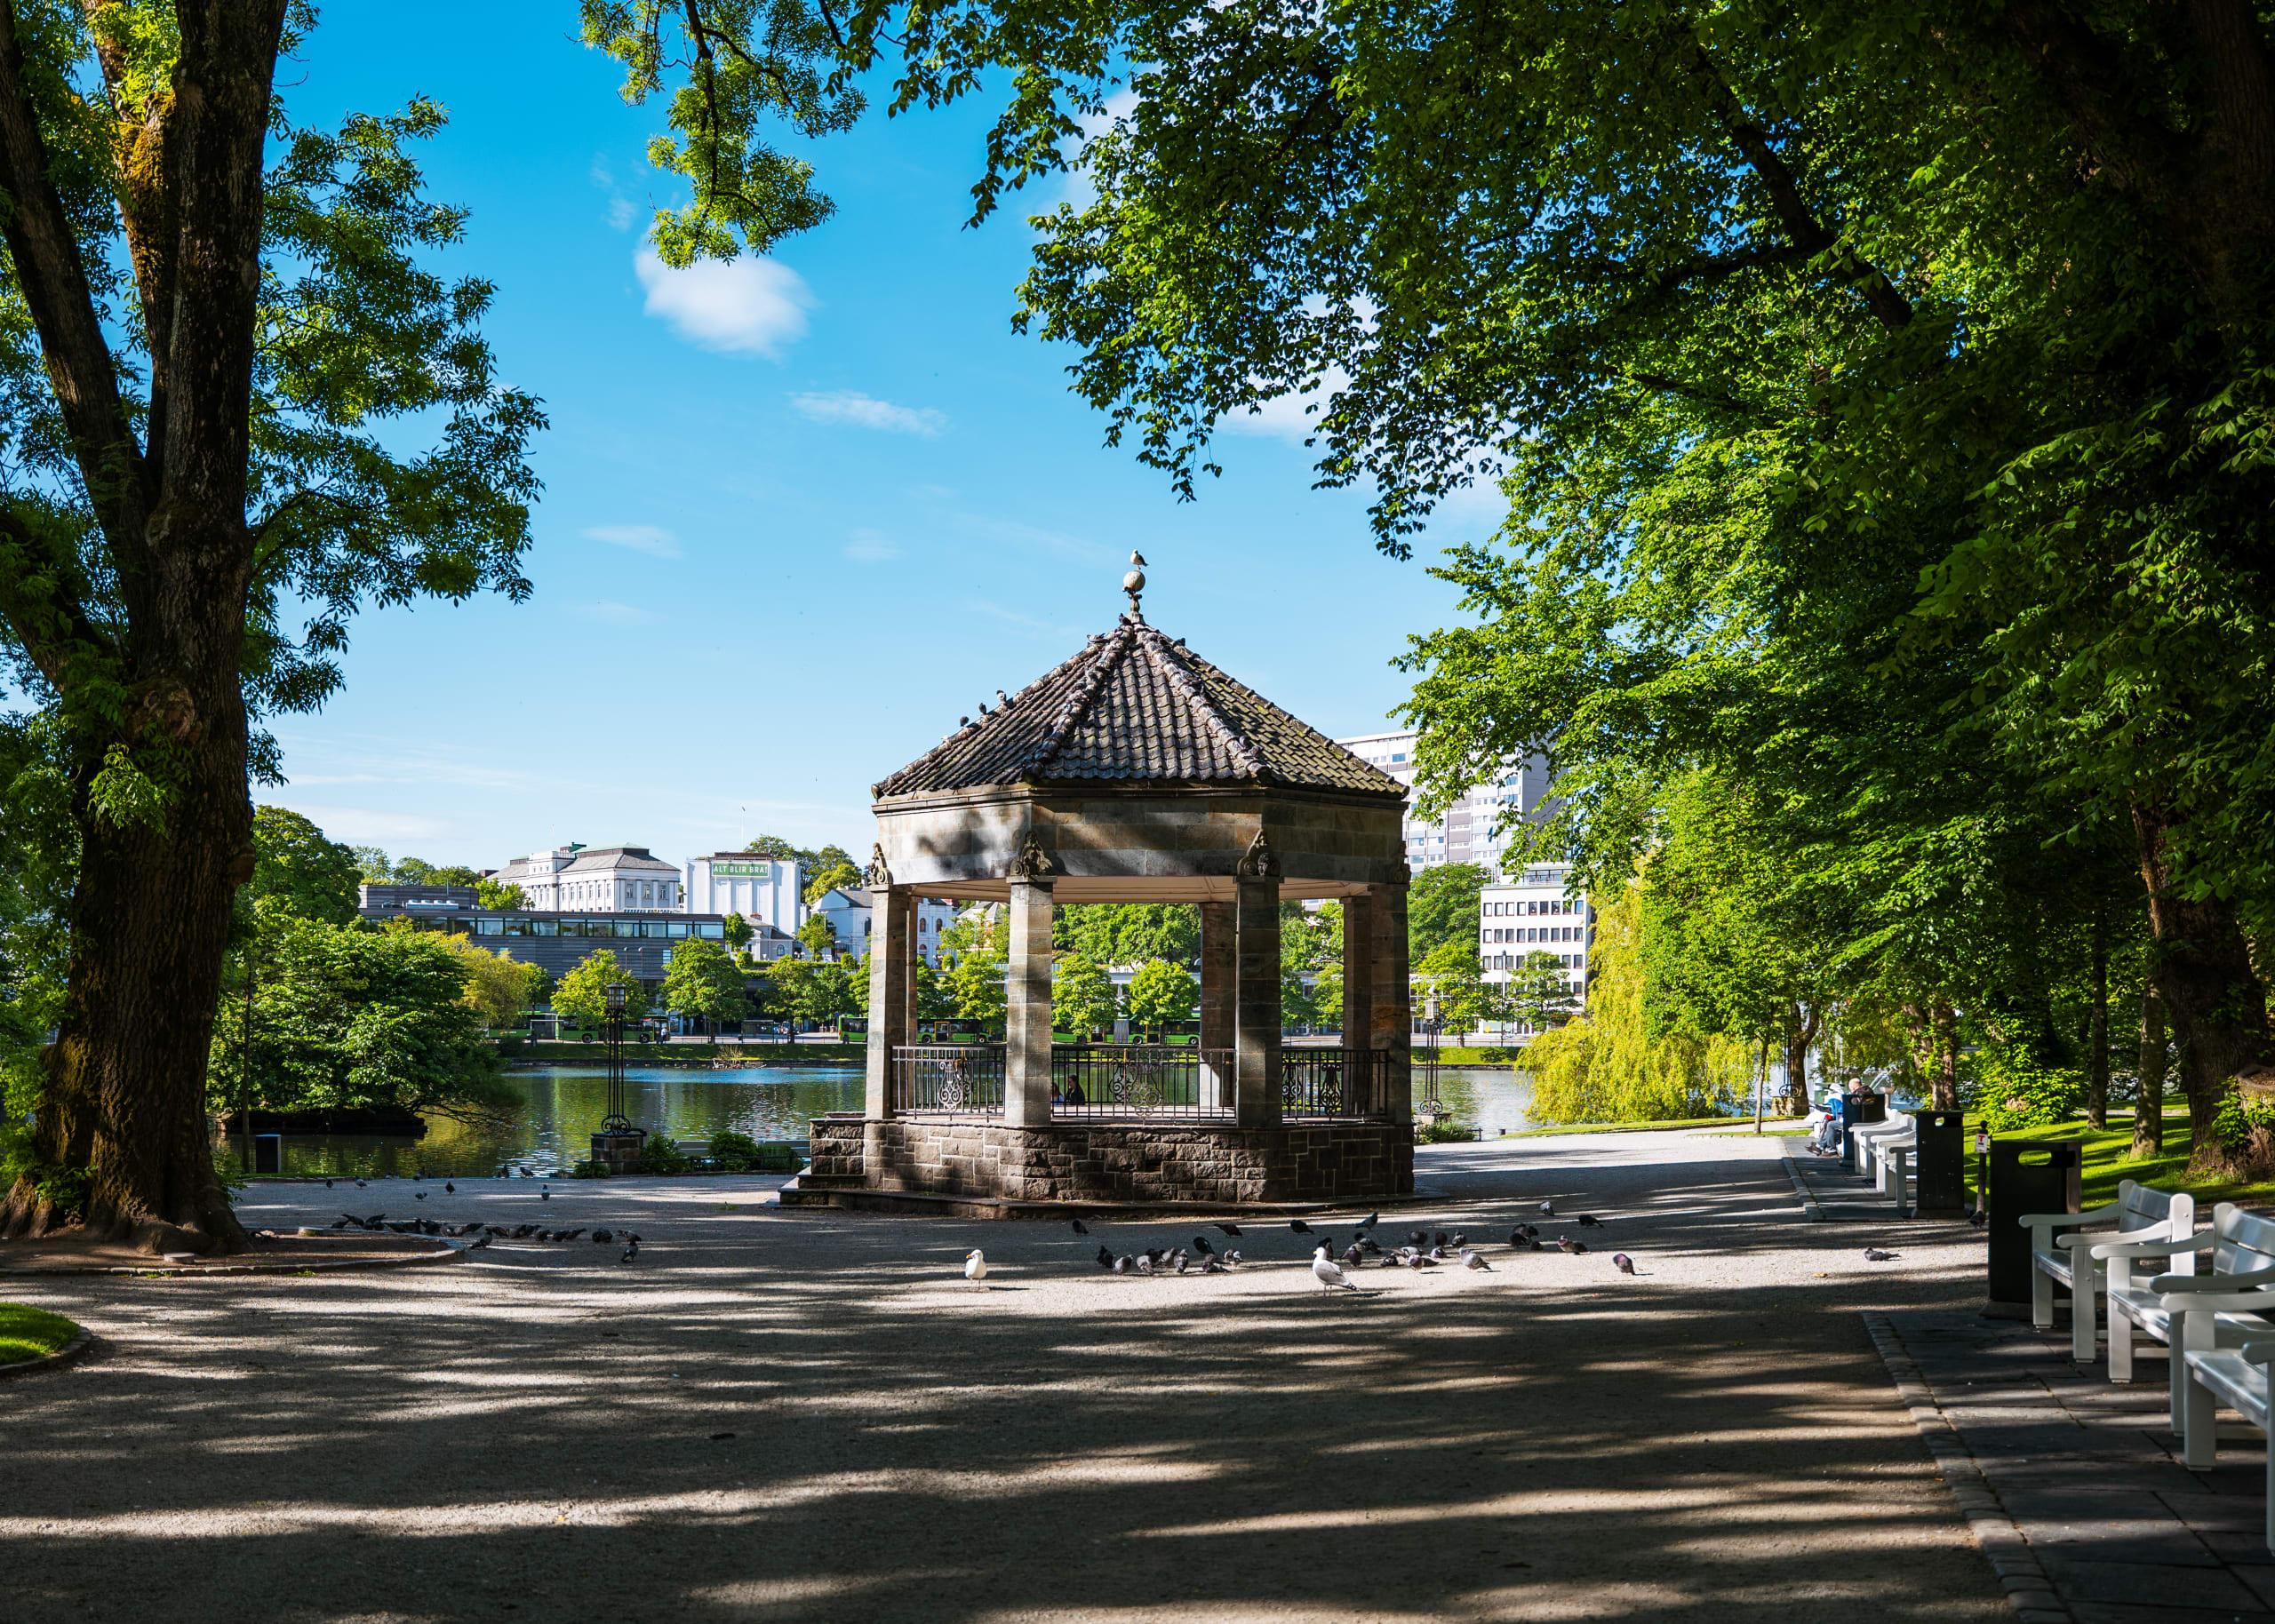 Pavilion in the city park of Stavanger